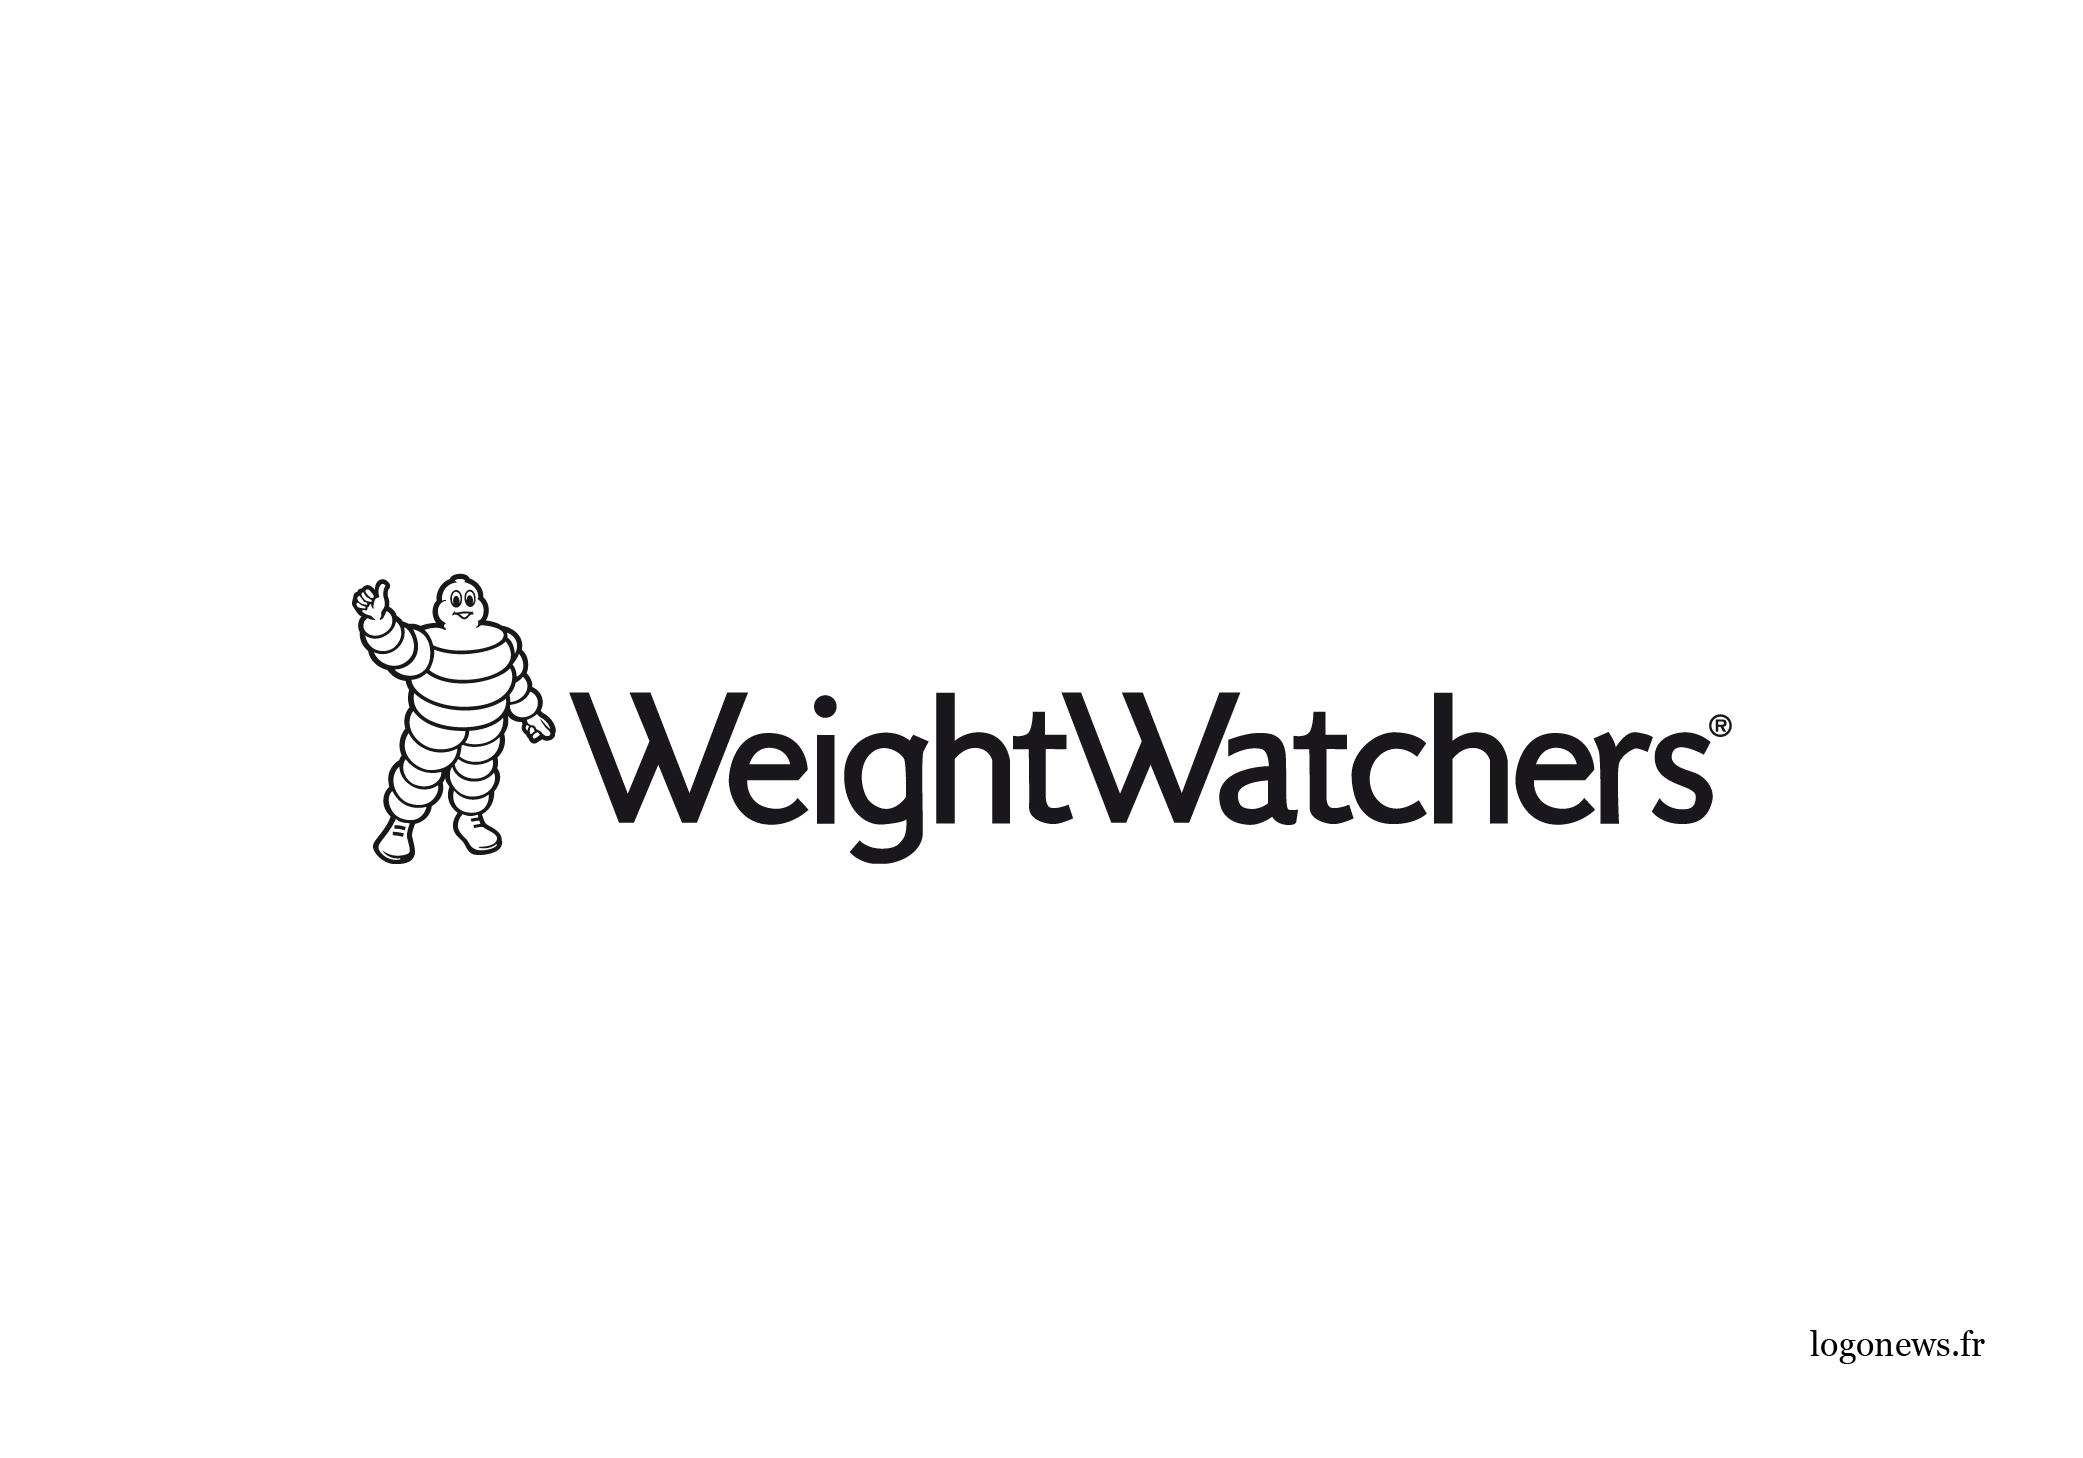 06_ logonews_remix_michelin_weight_watchers